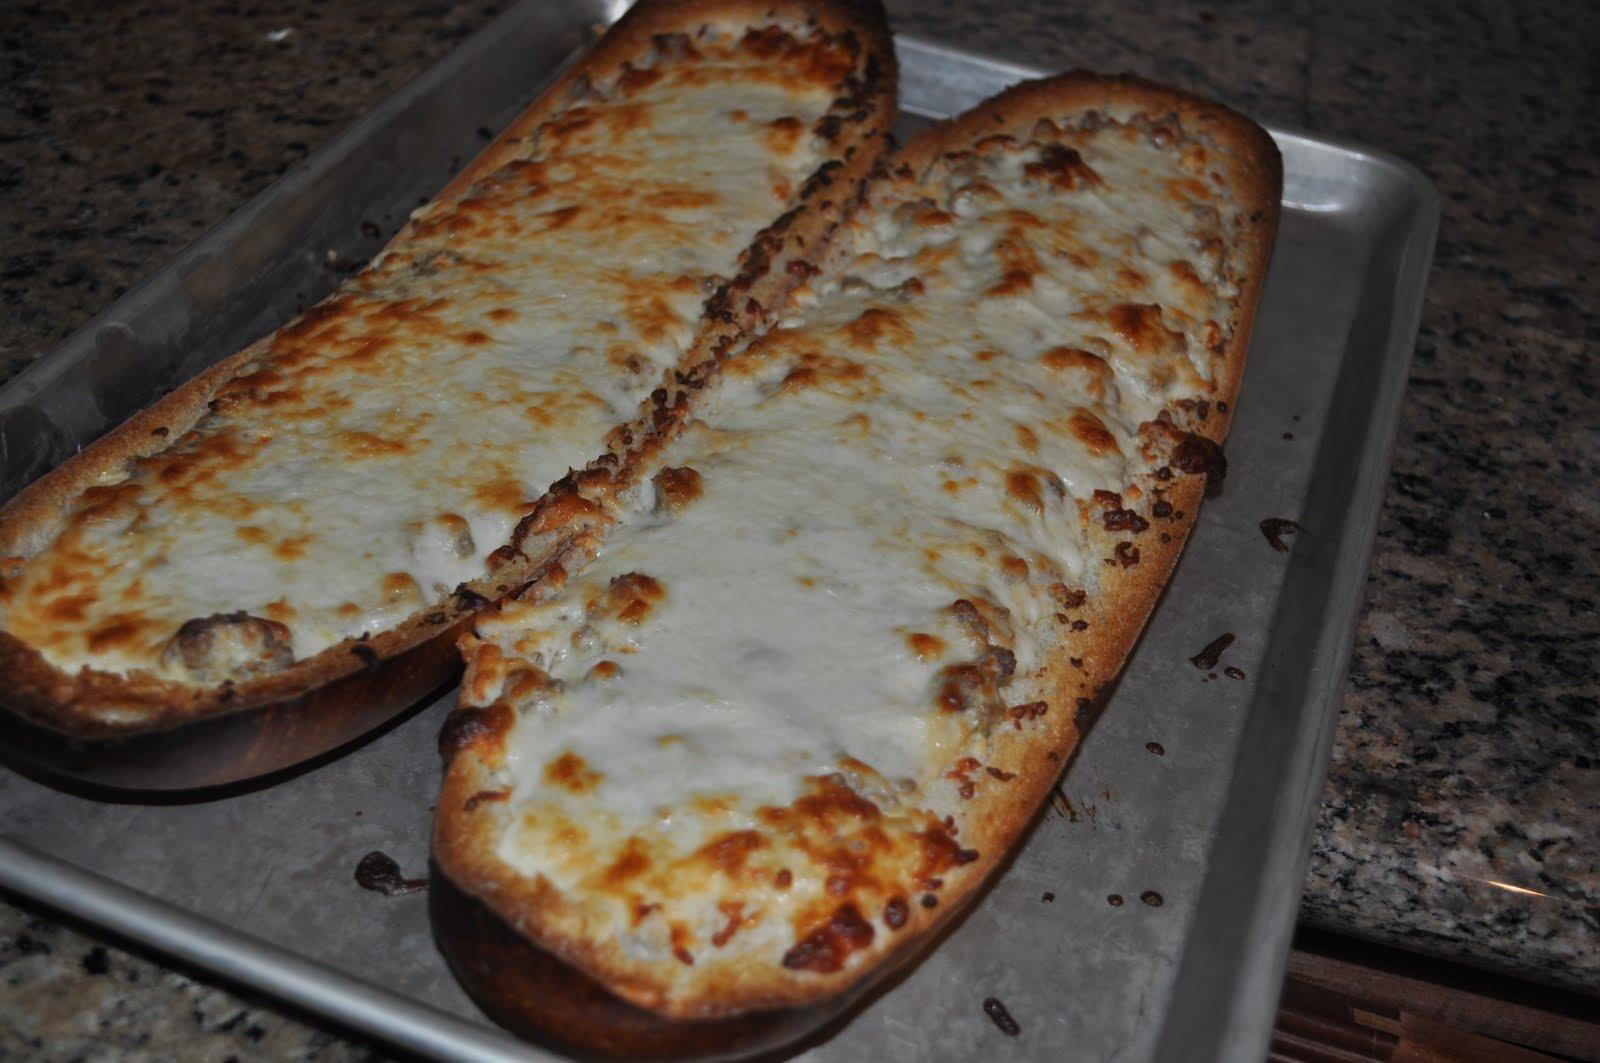 Beth's Favorite Recipes: Stuffed Italian Bread